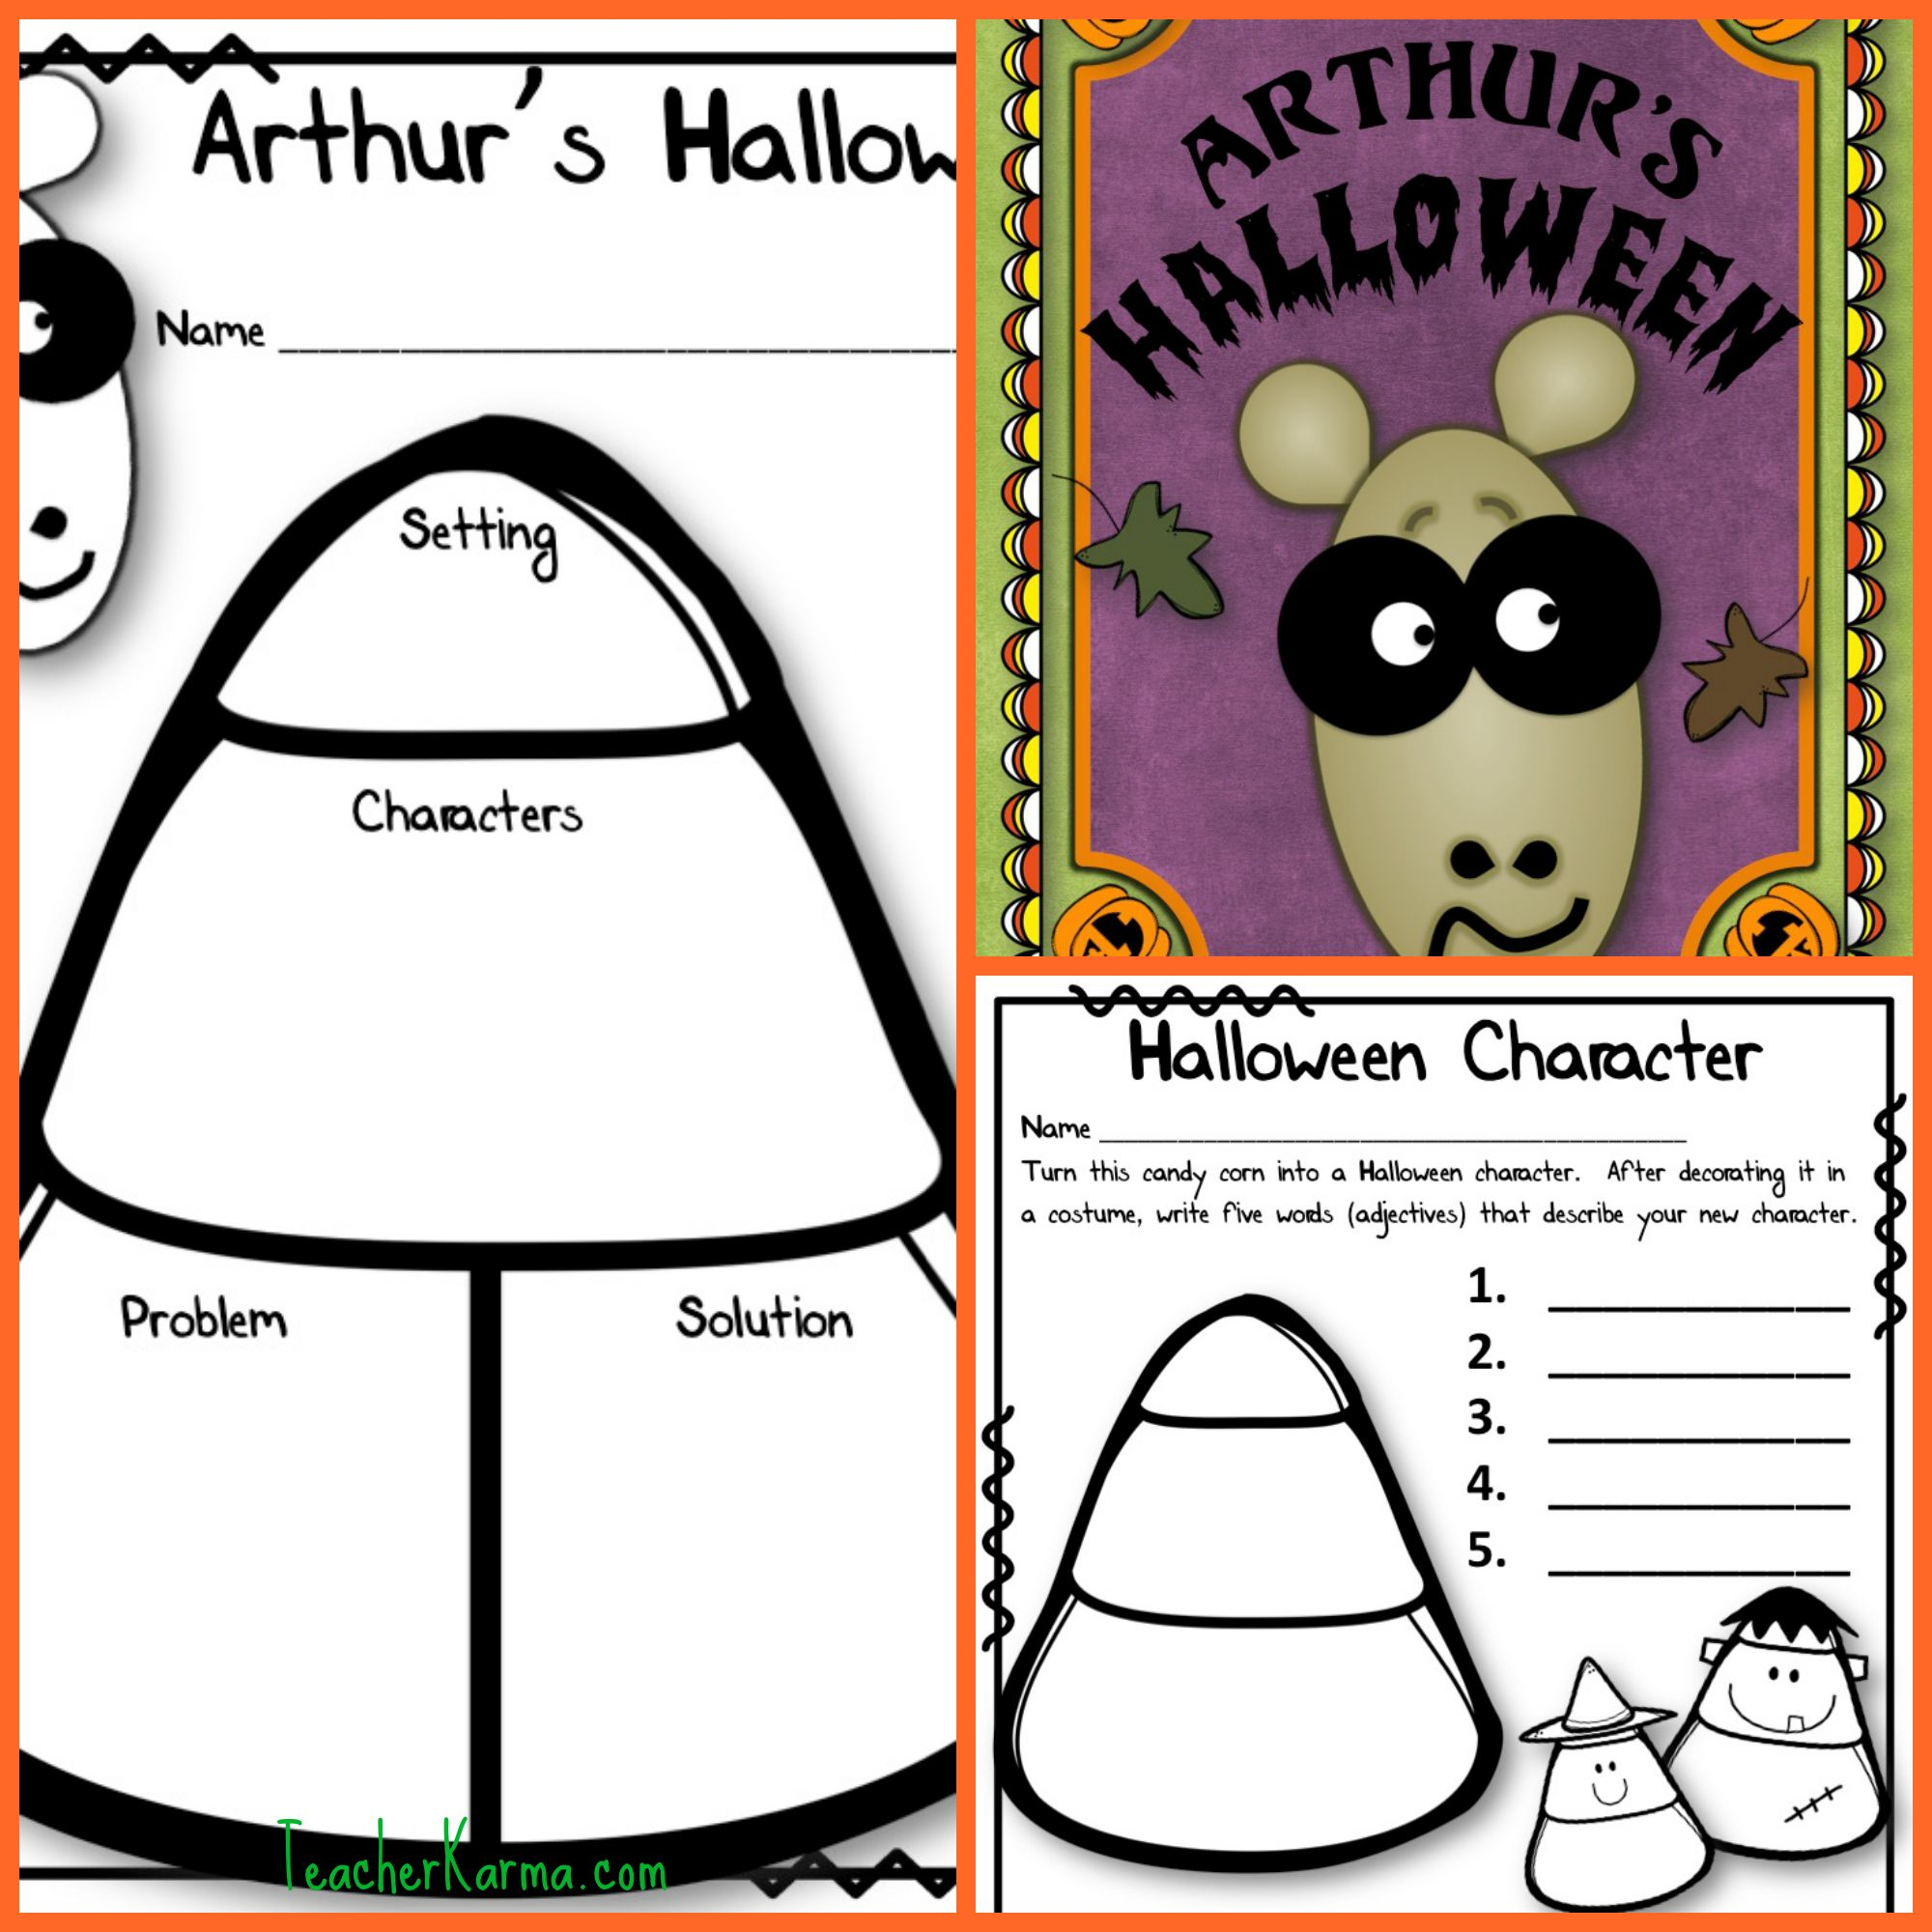 Arthur S Halloween Literacy Kit Story Elements Reading Comprehension